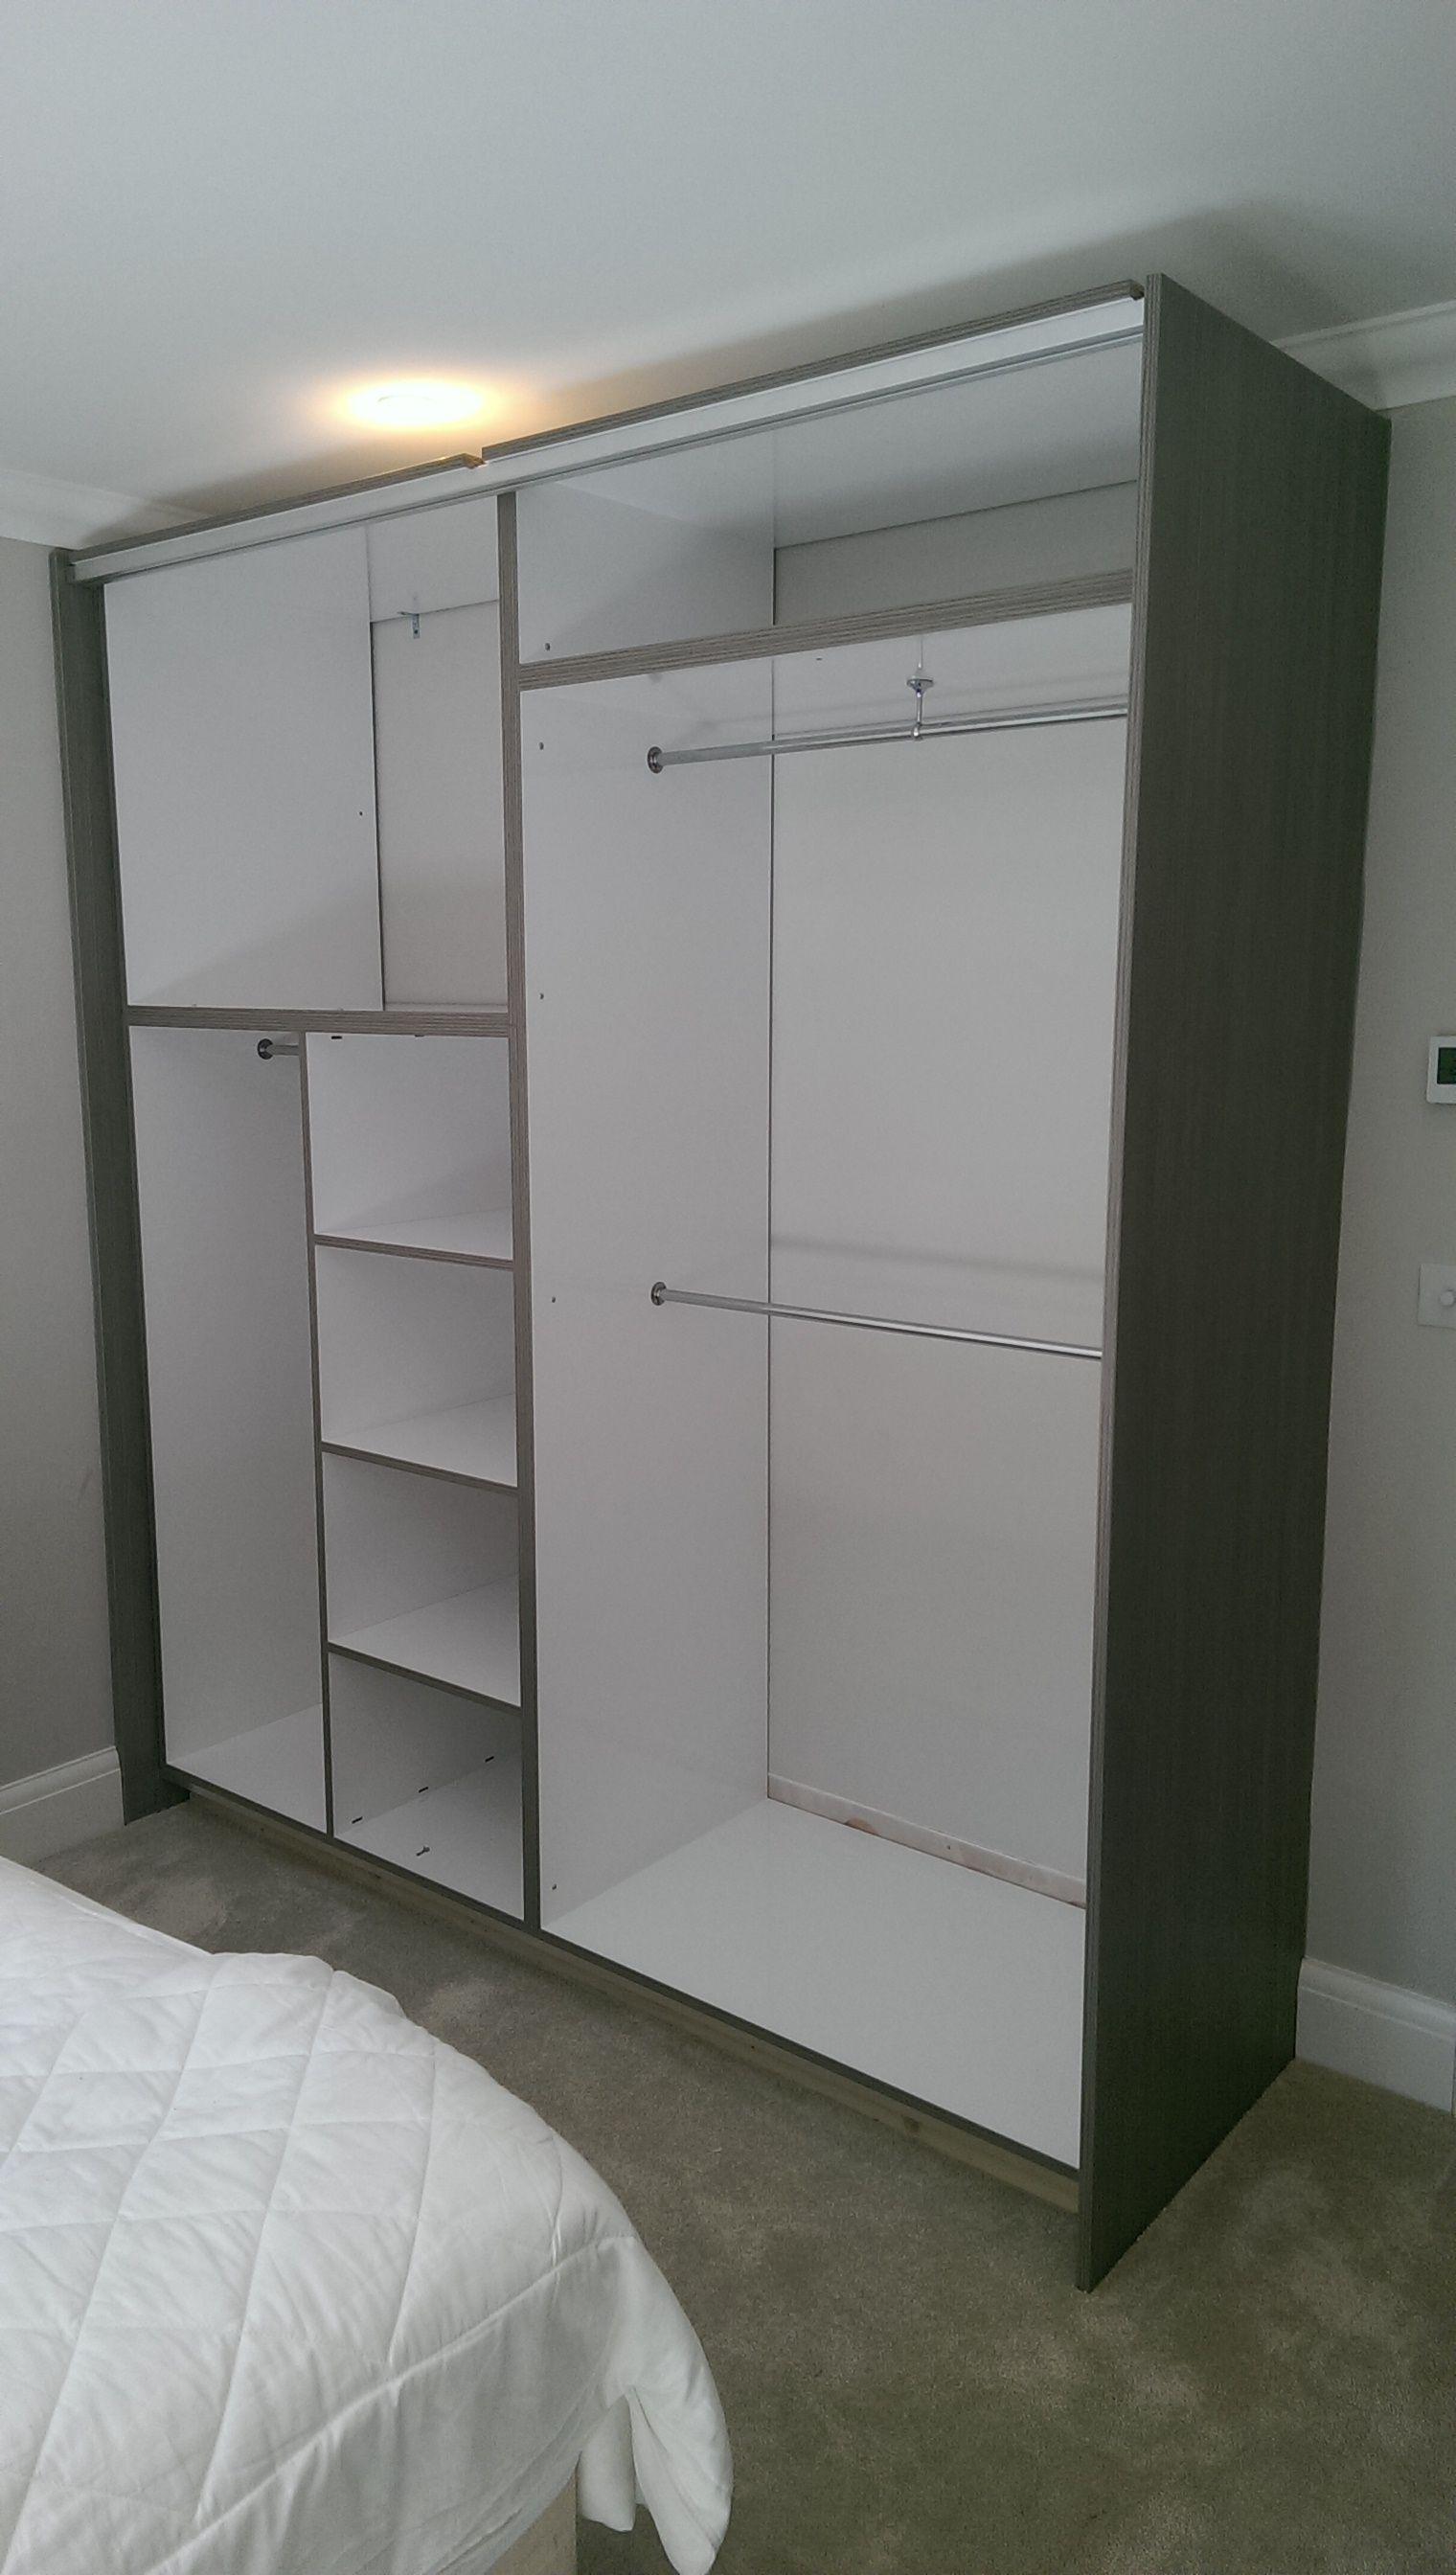 Bedroom Wardrobe Egger Melamine Faced Boards Bedroom Wardrobe Home Decor Decor